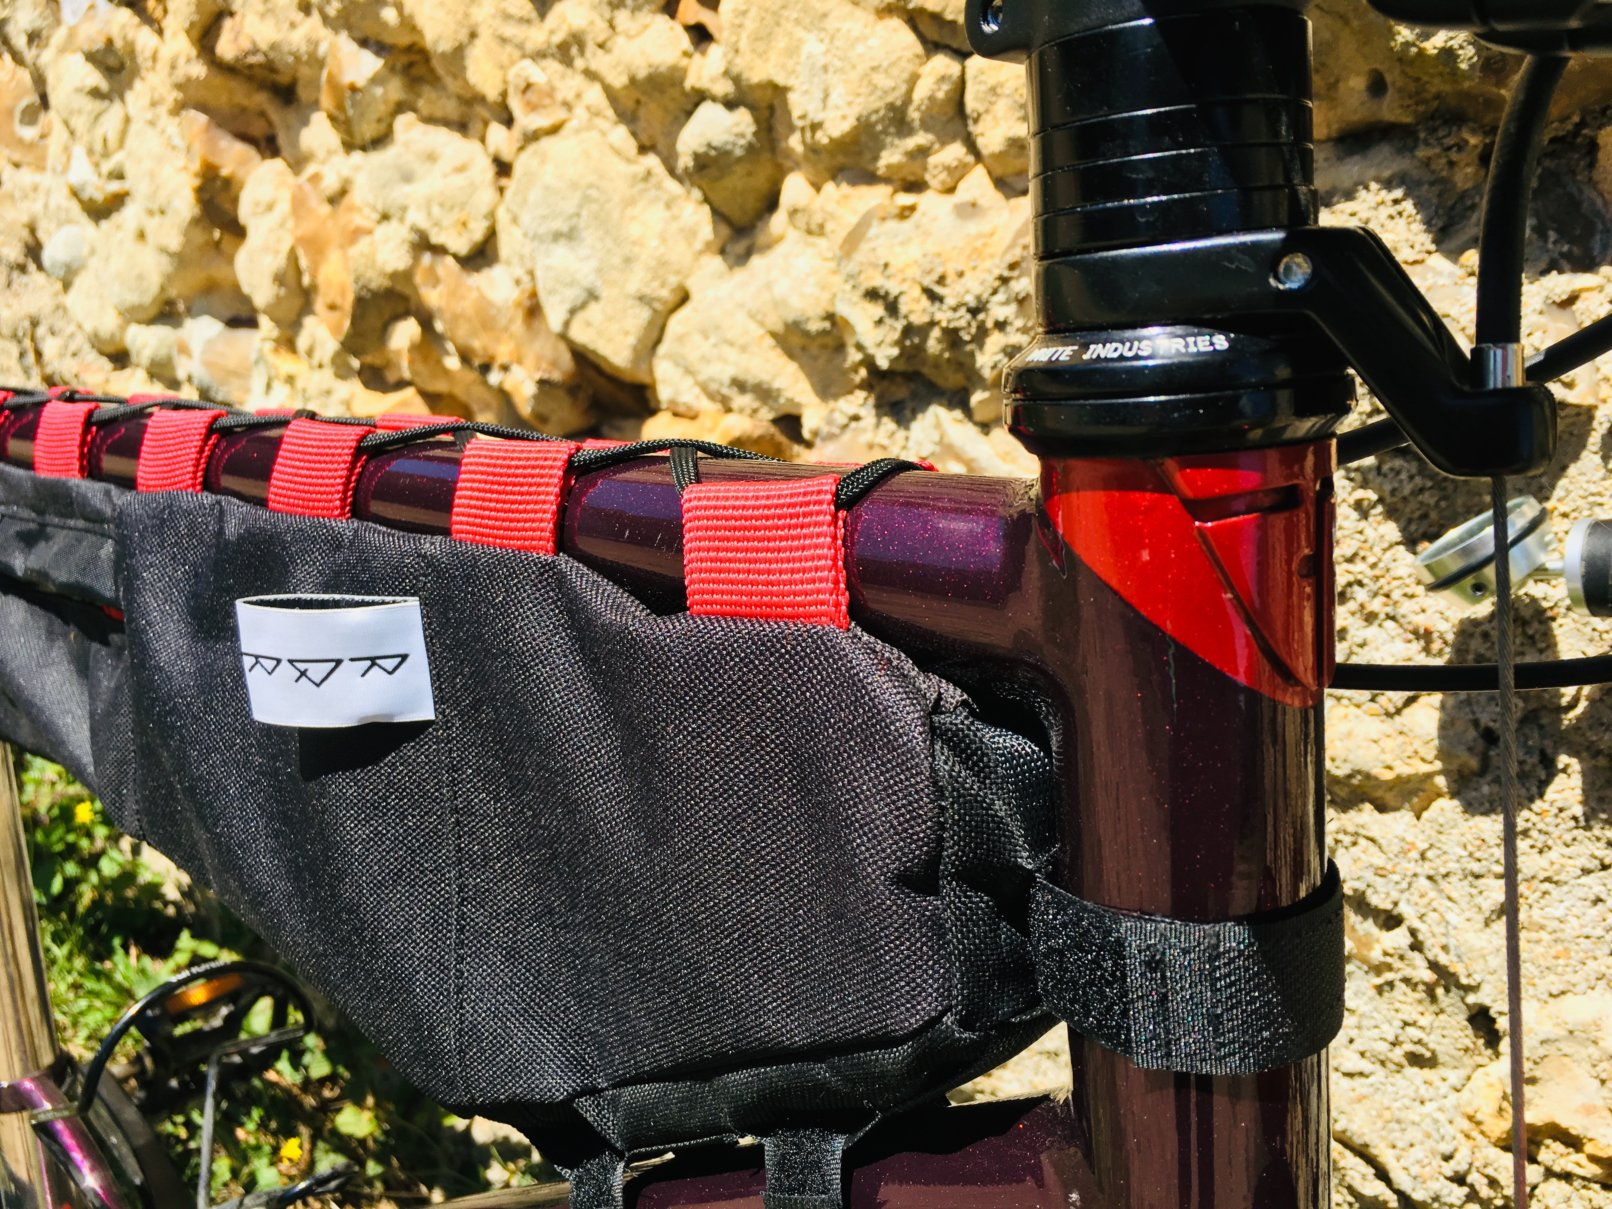 Vélo Taillefer Cycles, Pierre Glottin, Mangeuse de kilometre